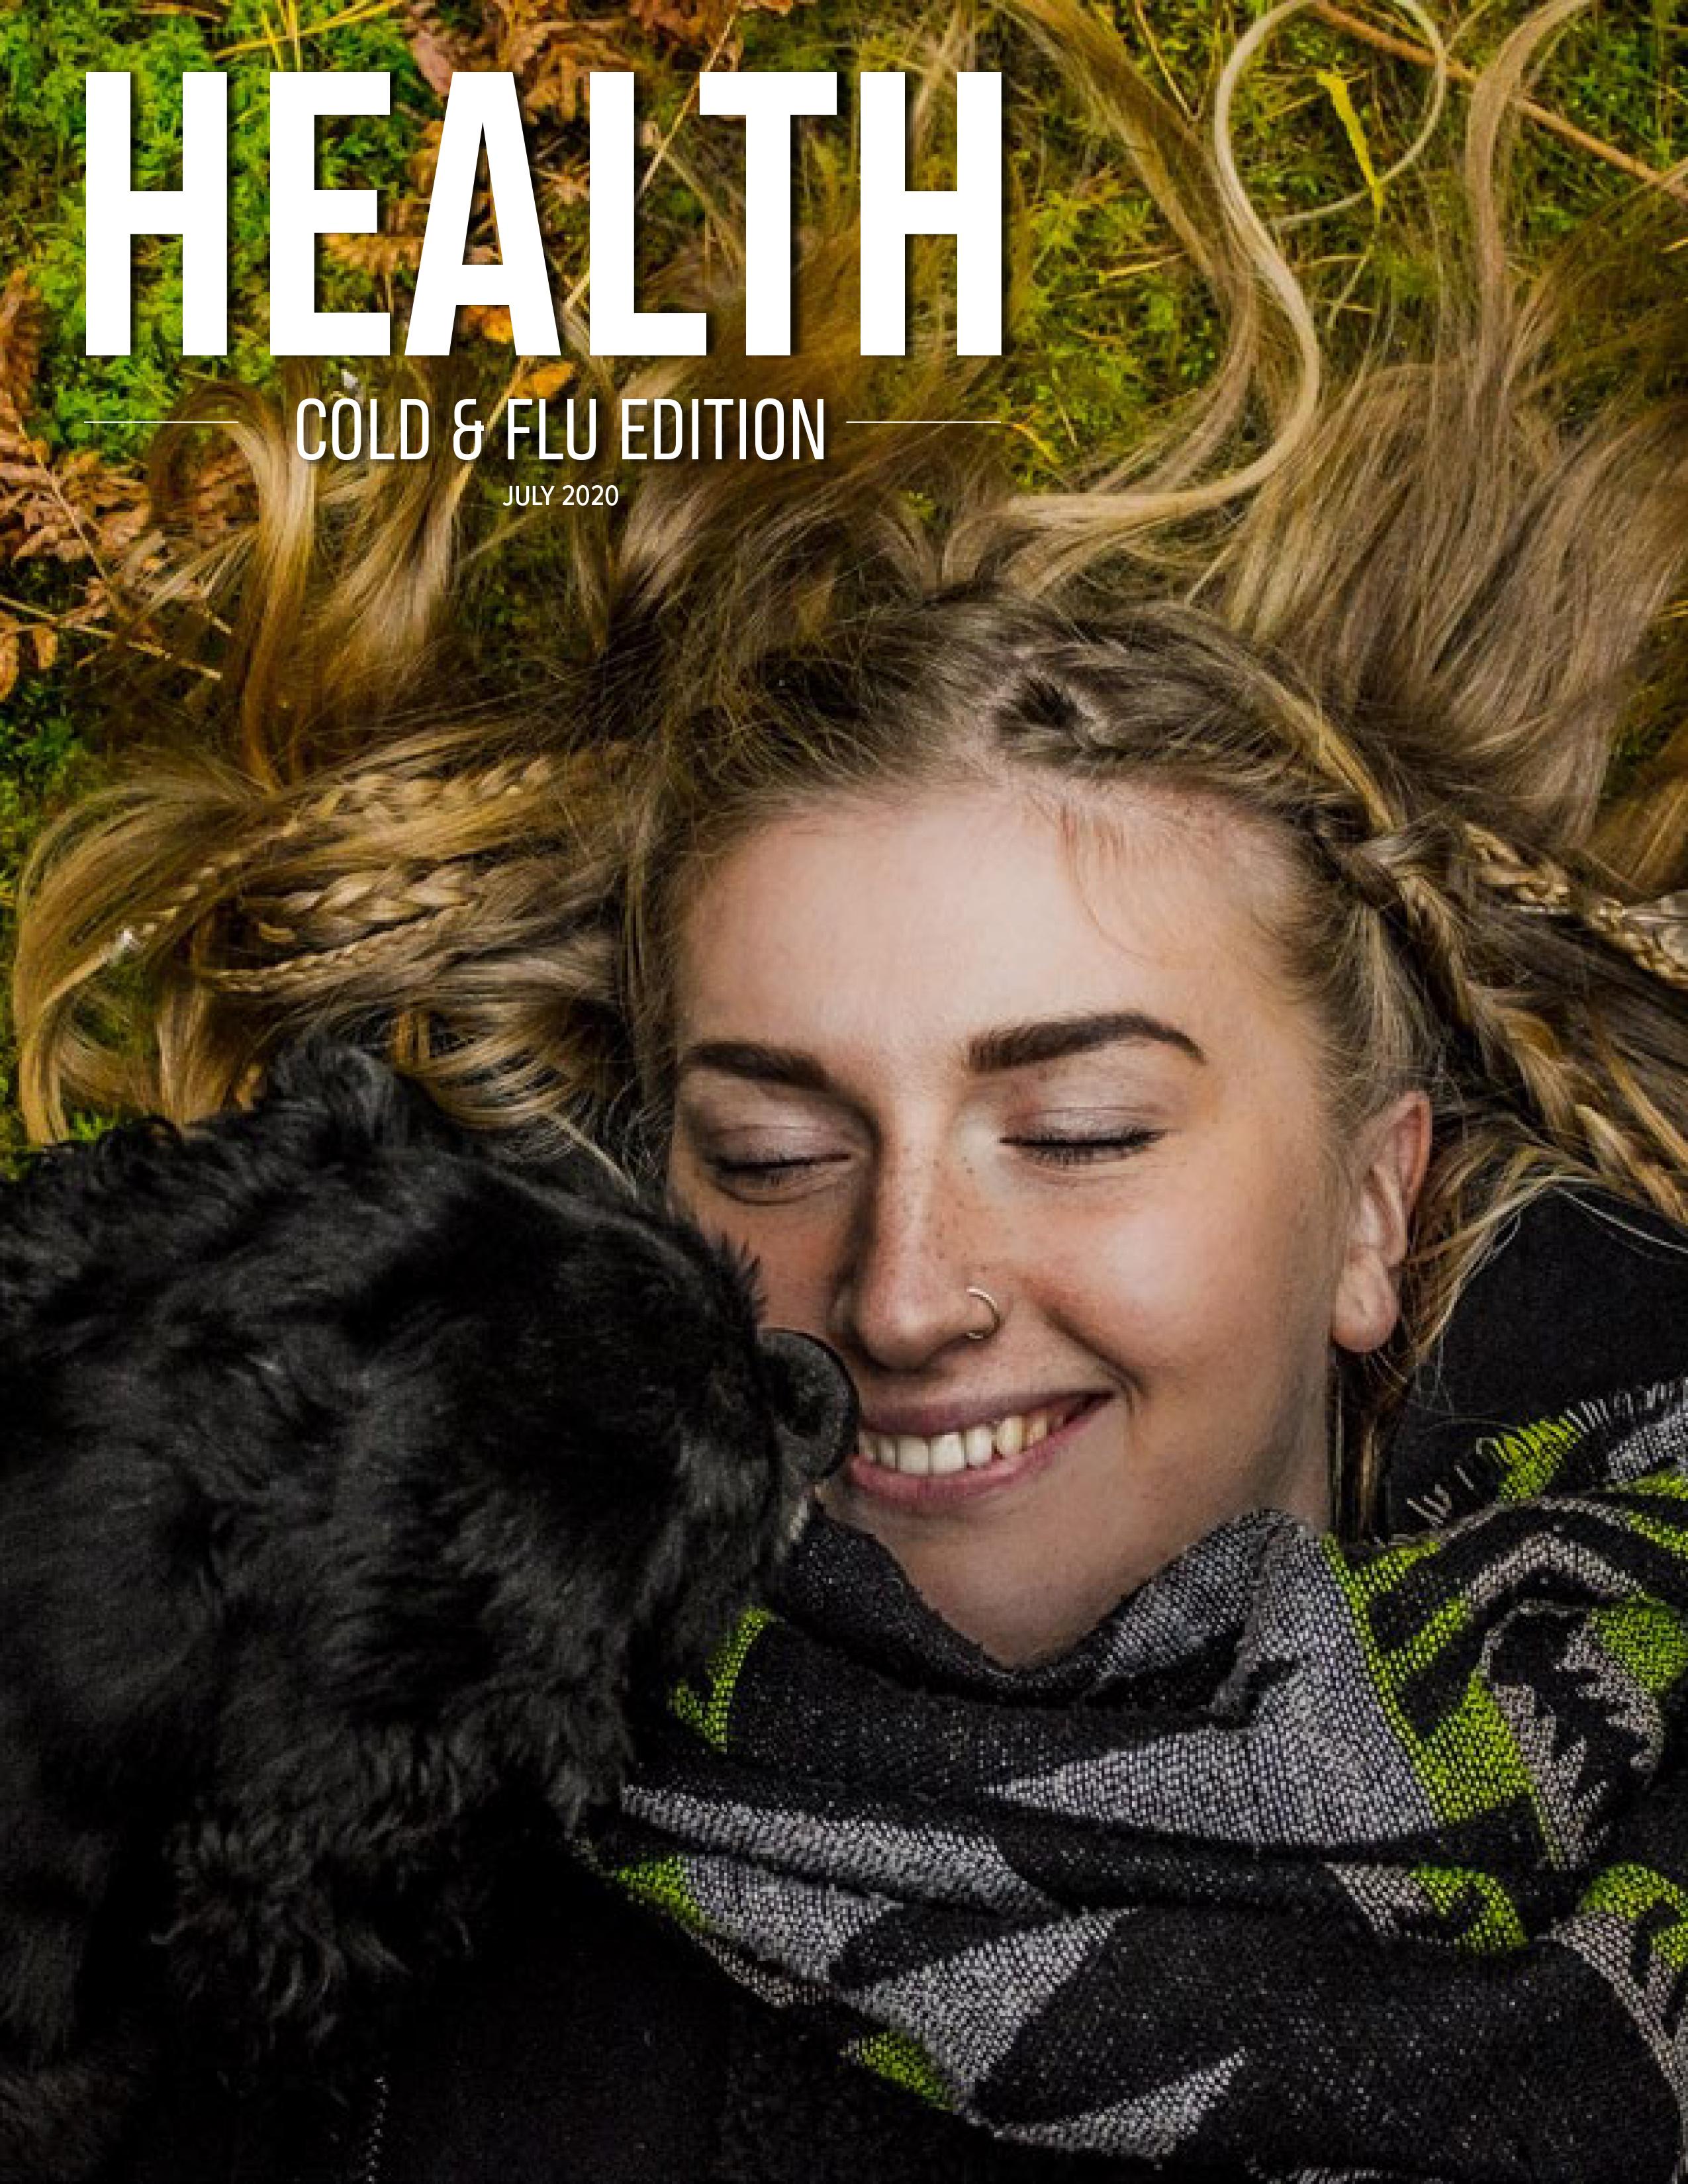 IOL Health: Cold & Flu Issue